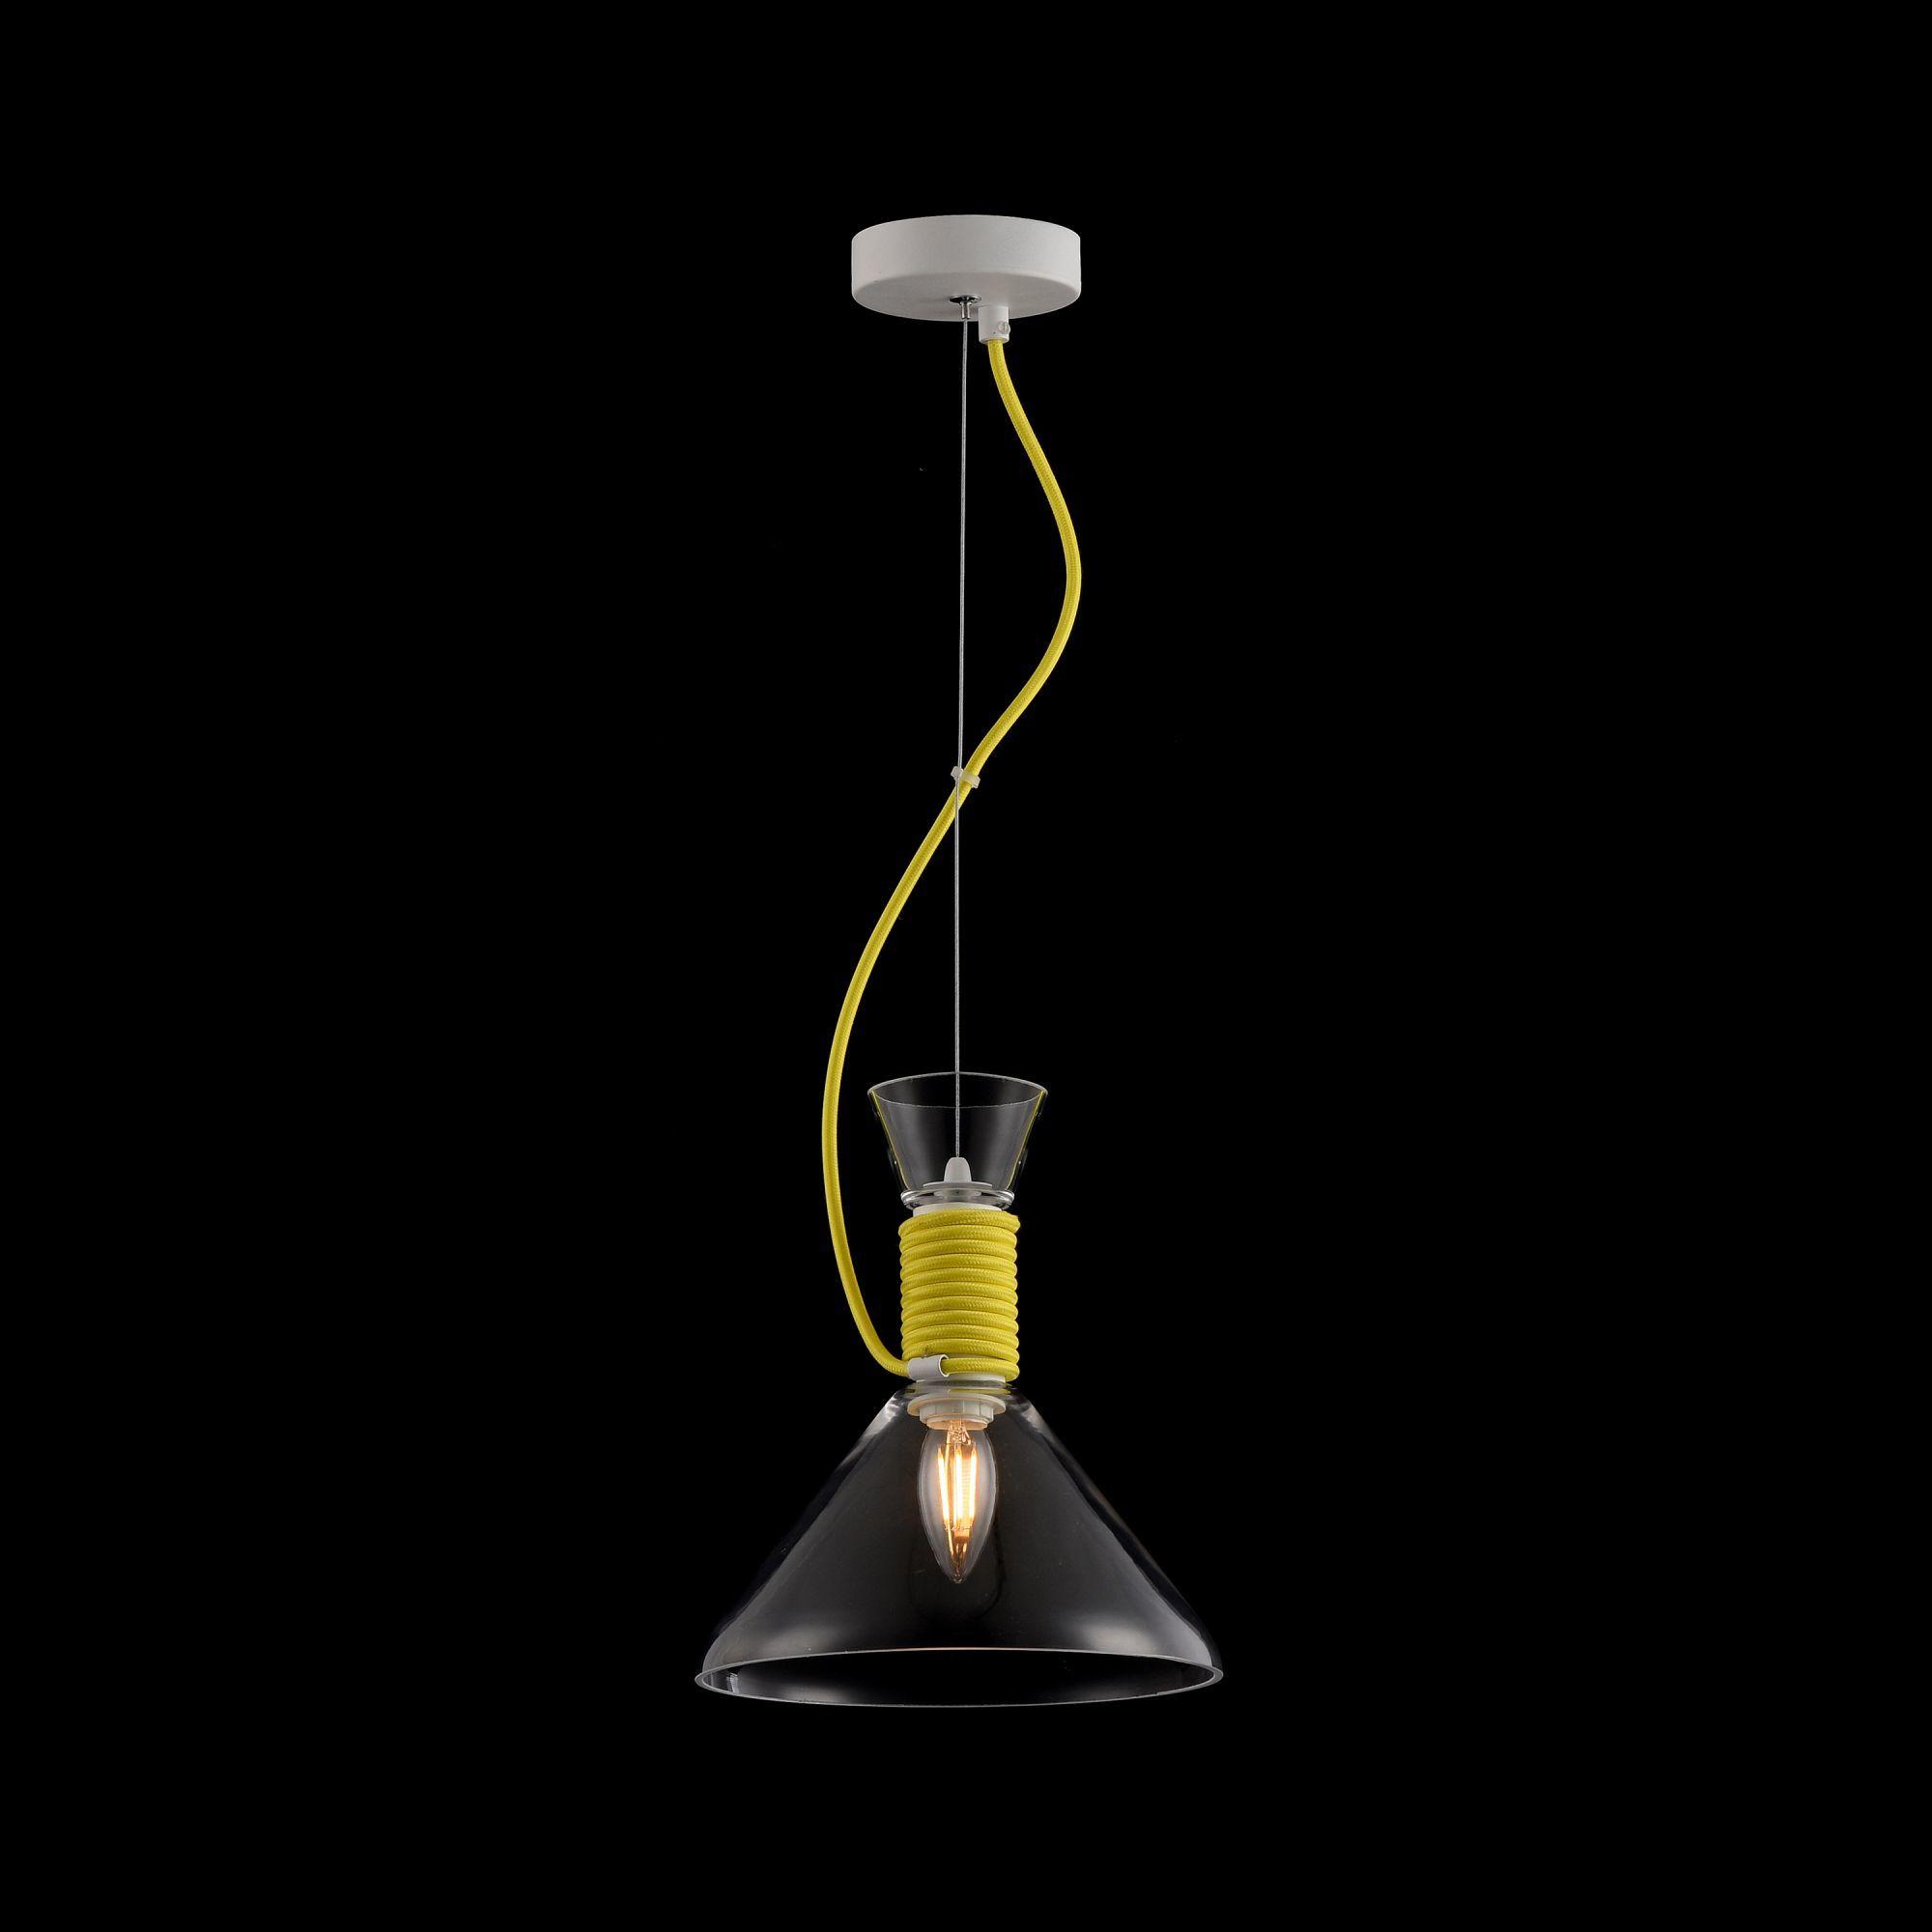 Подвесной светильник Maytoni Modern California P536PL-01YW, 1xE14x40W, белый, желтый, прозрачный, металл, стекло - фото 5